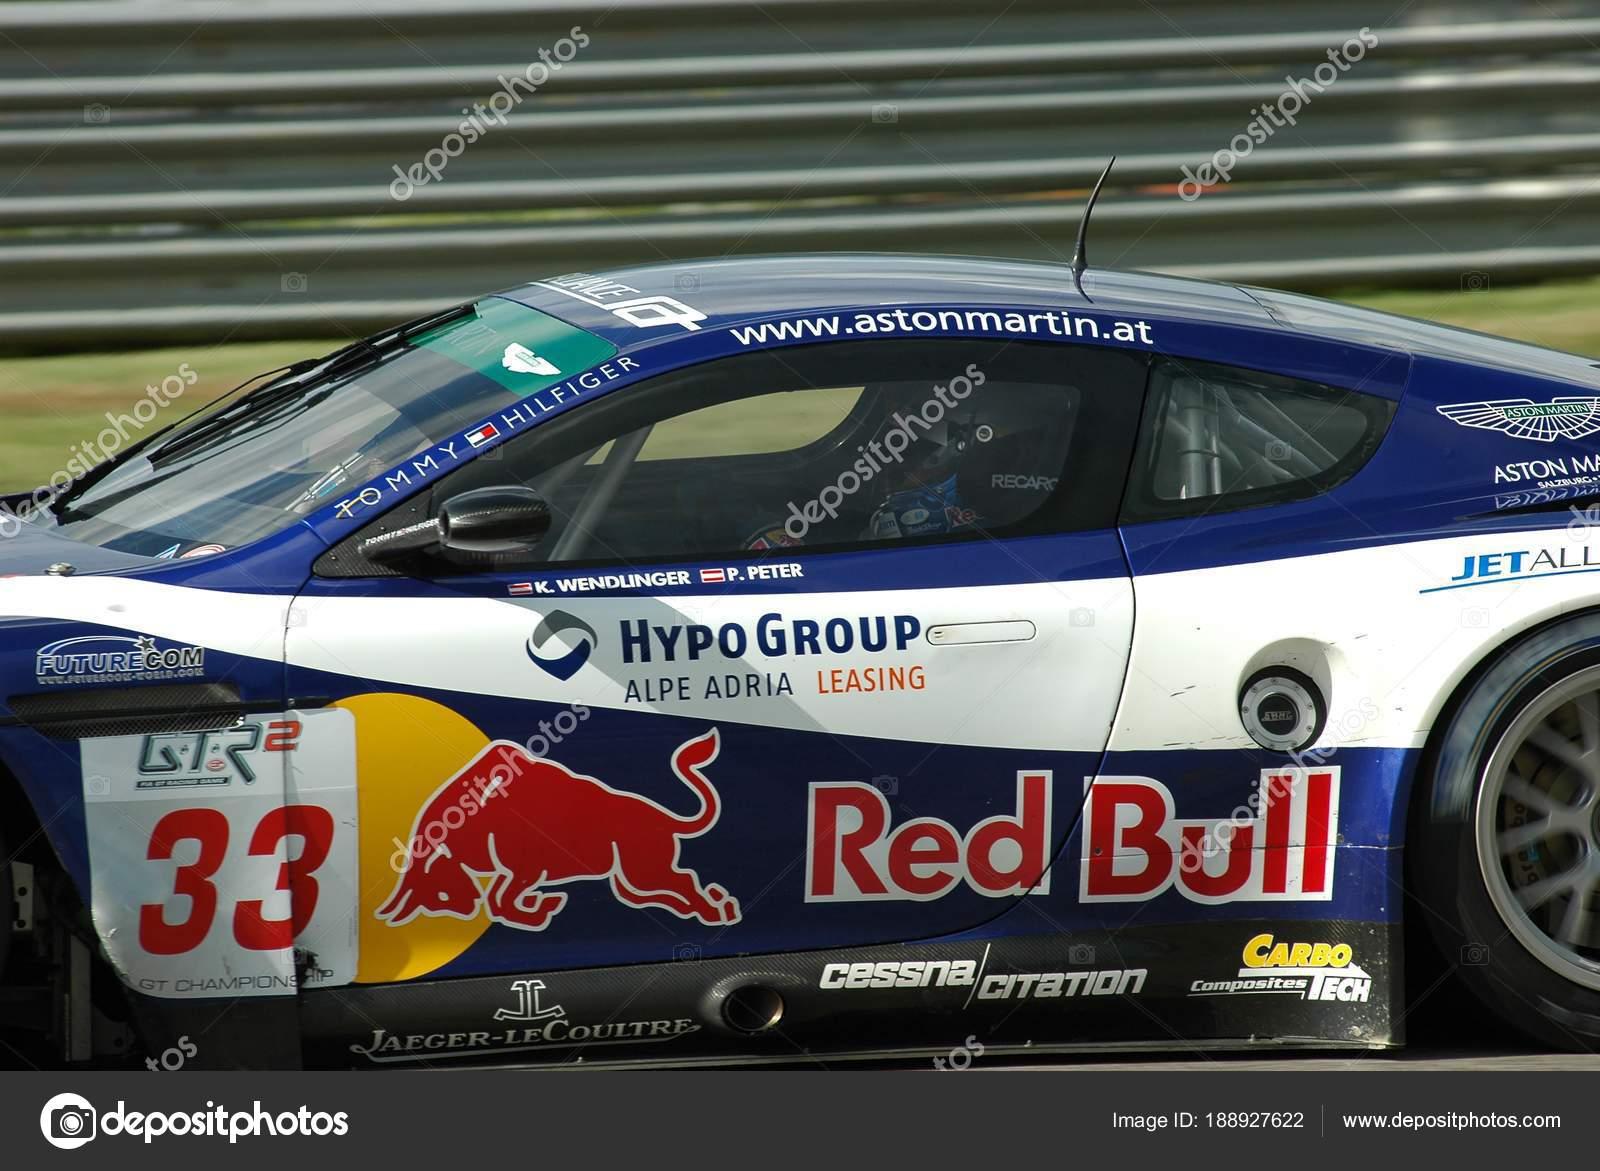 September 2006 Aston Martin Dbr9 Gt1 Race Alliance Motorsport Team Stock Editorial Photo C Dan74 188927622